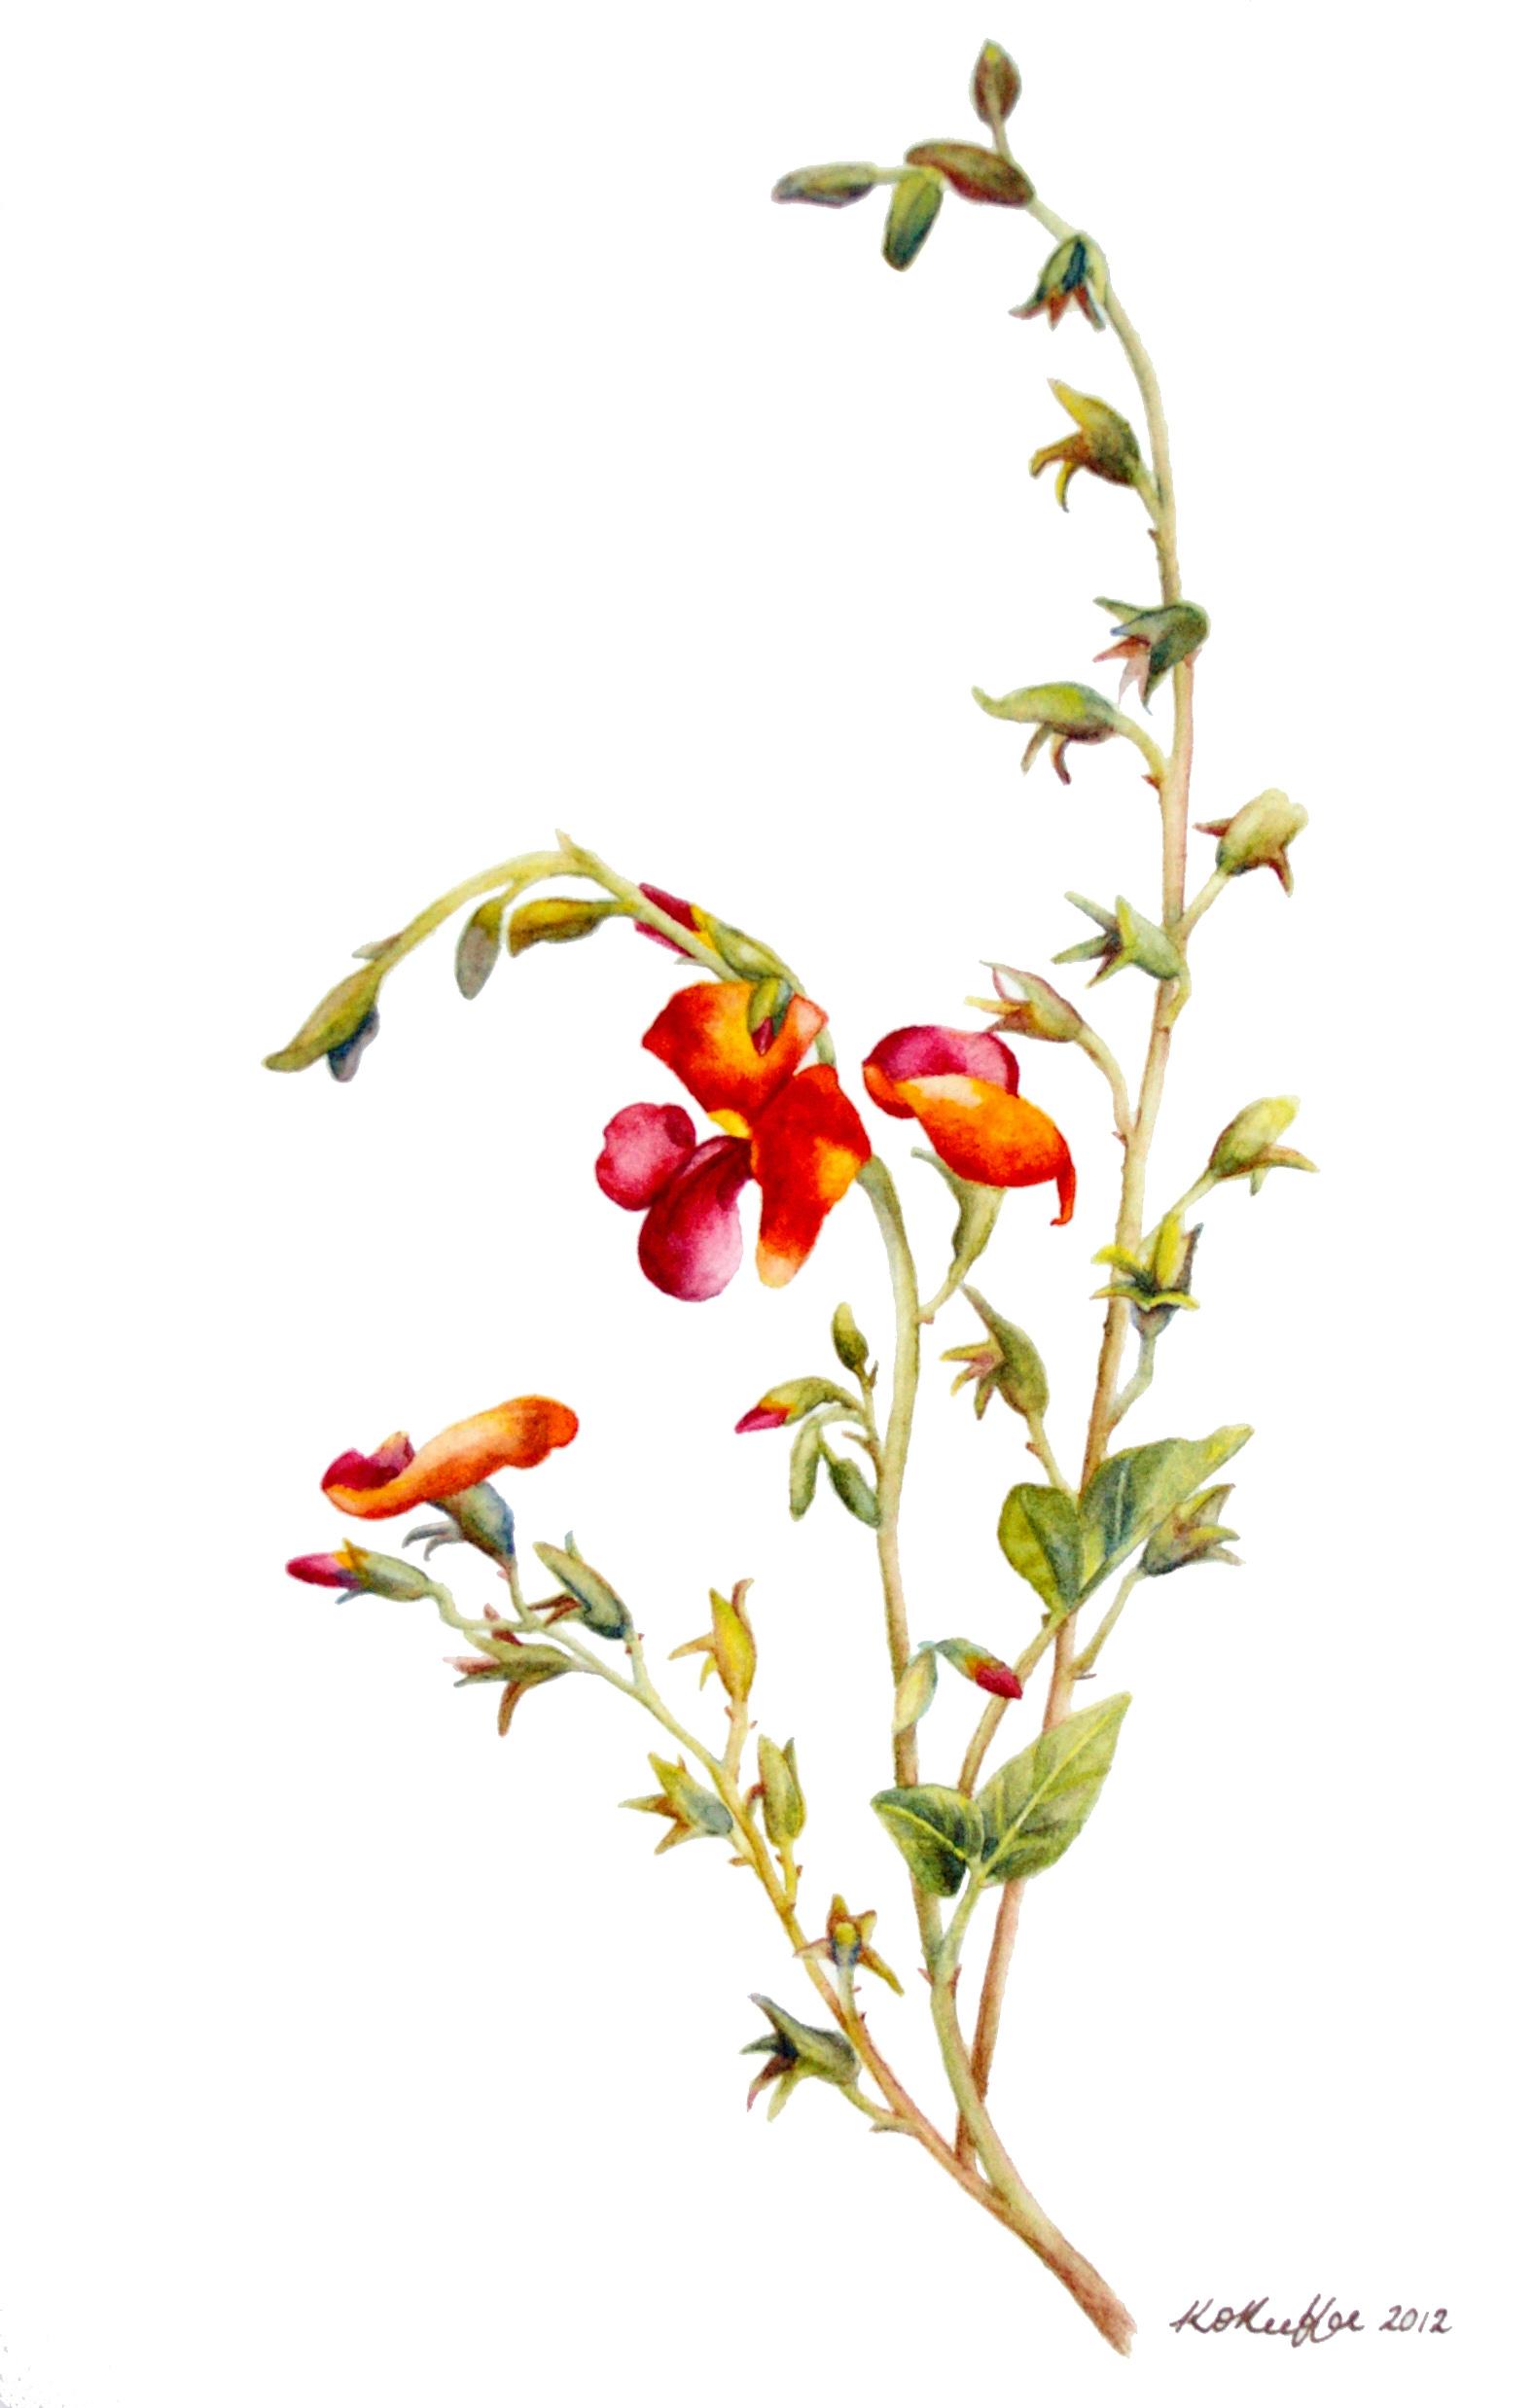 Chorizema cordatum